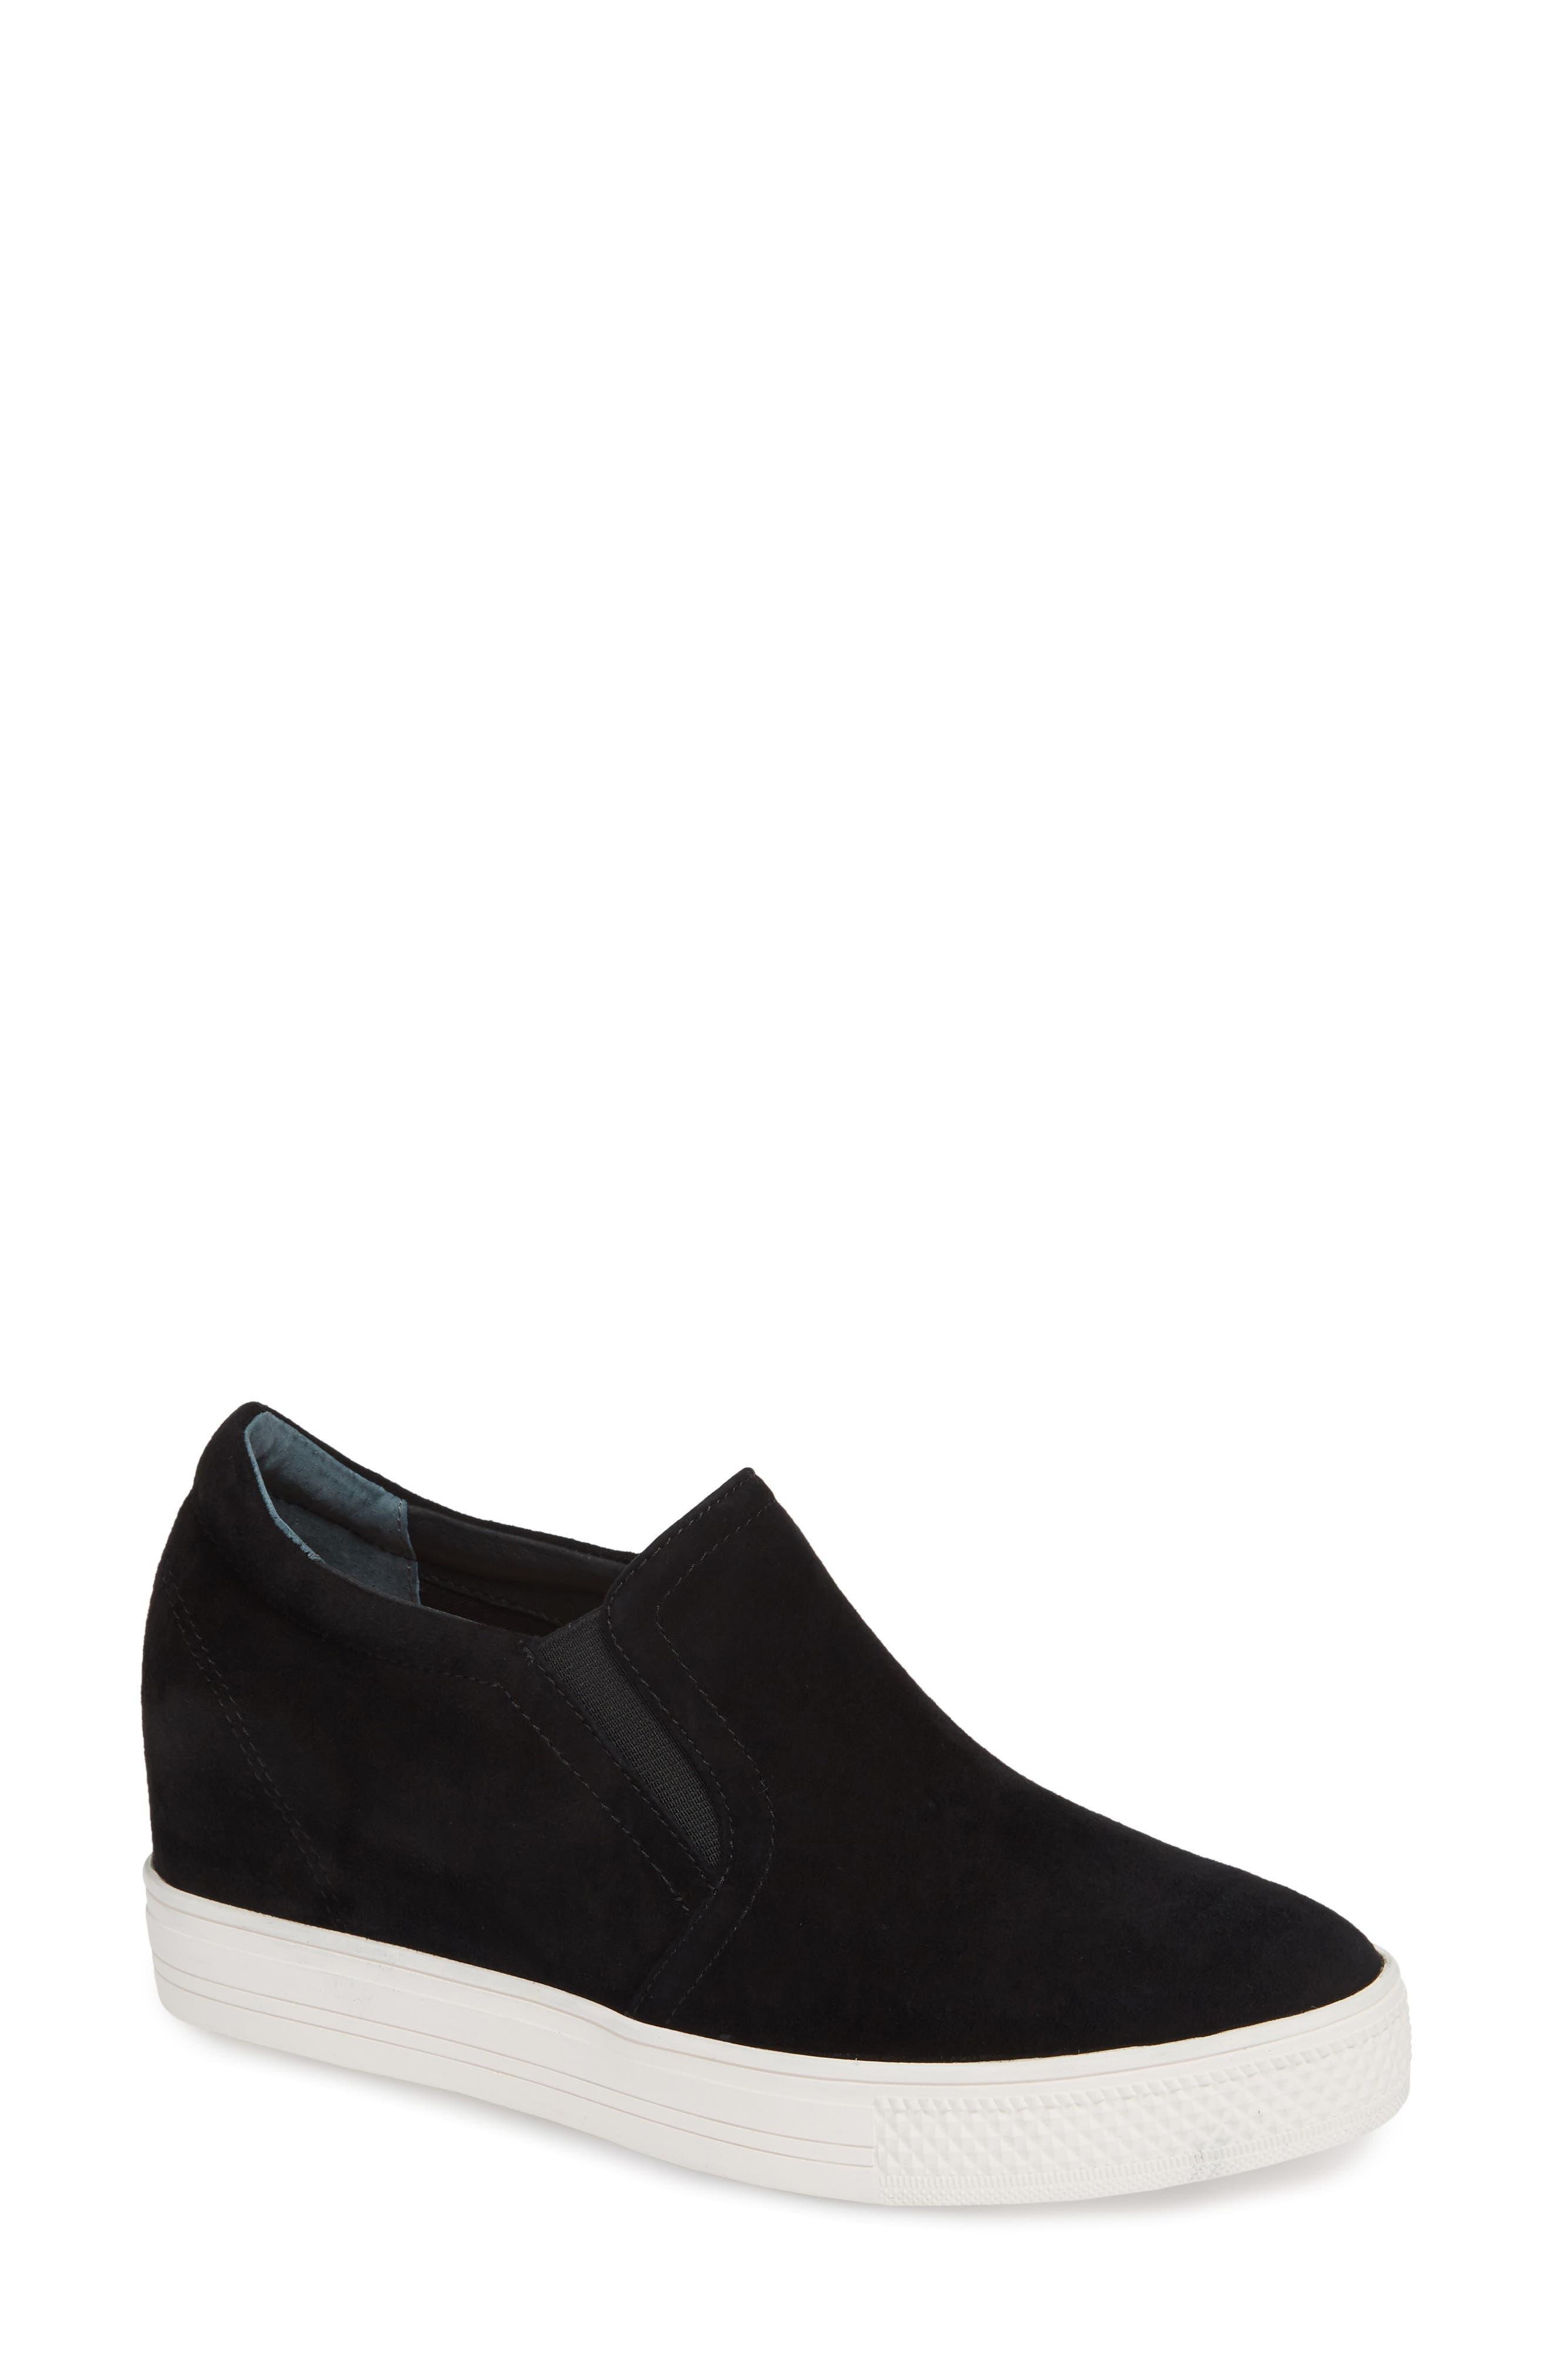 CASLON<SUP>®</SUP> Austin Slip-On Sneaker, Main, color, BLACK SUEDE